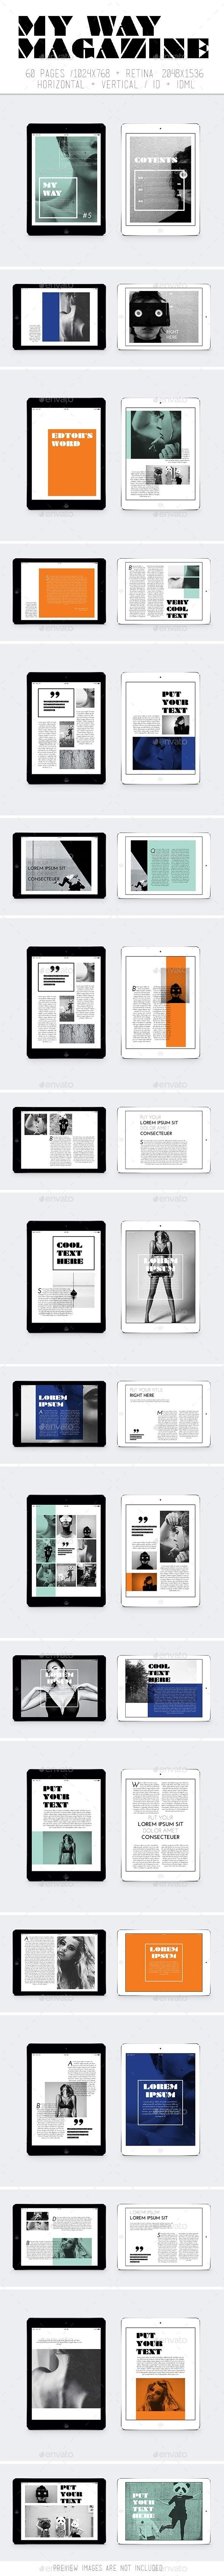 Ipad&Tablet My Way Magazine Template #design Download: http://graphicriver.net/item/ipadtablet-my-way-magazine/11198101?ref=ksioks